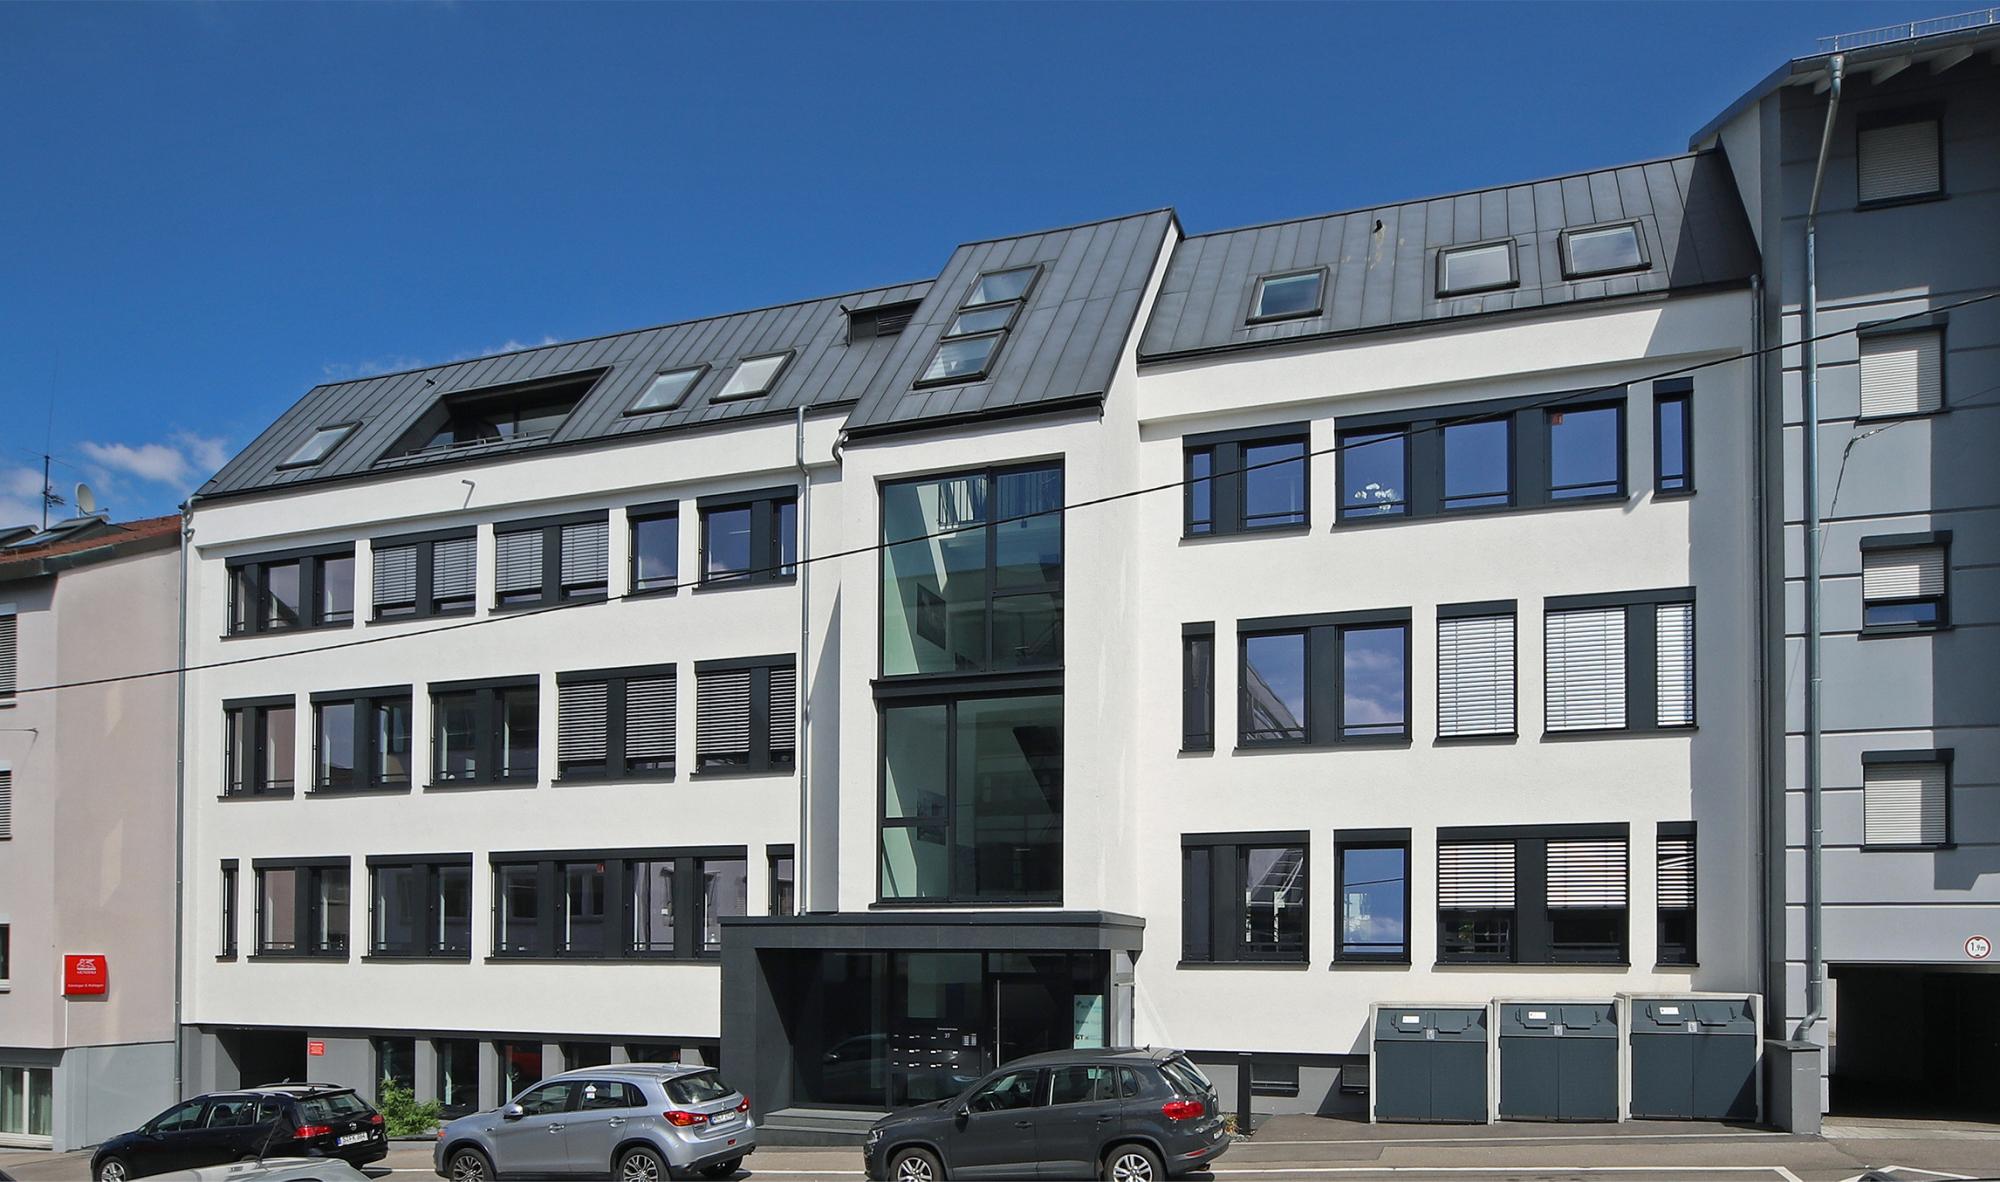 Bürohaus nach Umbau, Foto: Markus Mahle, Stuttgart